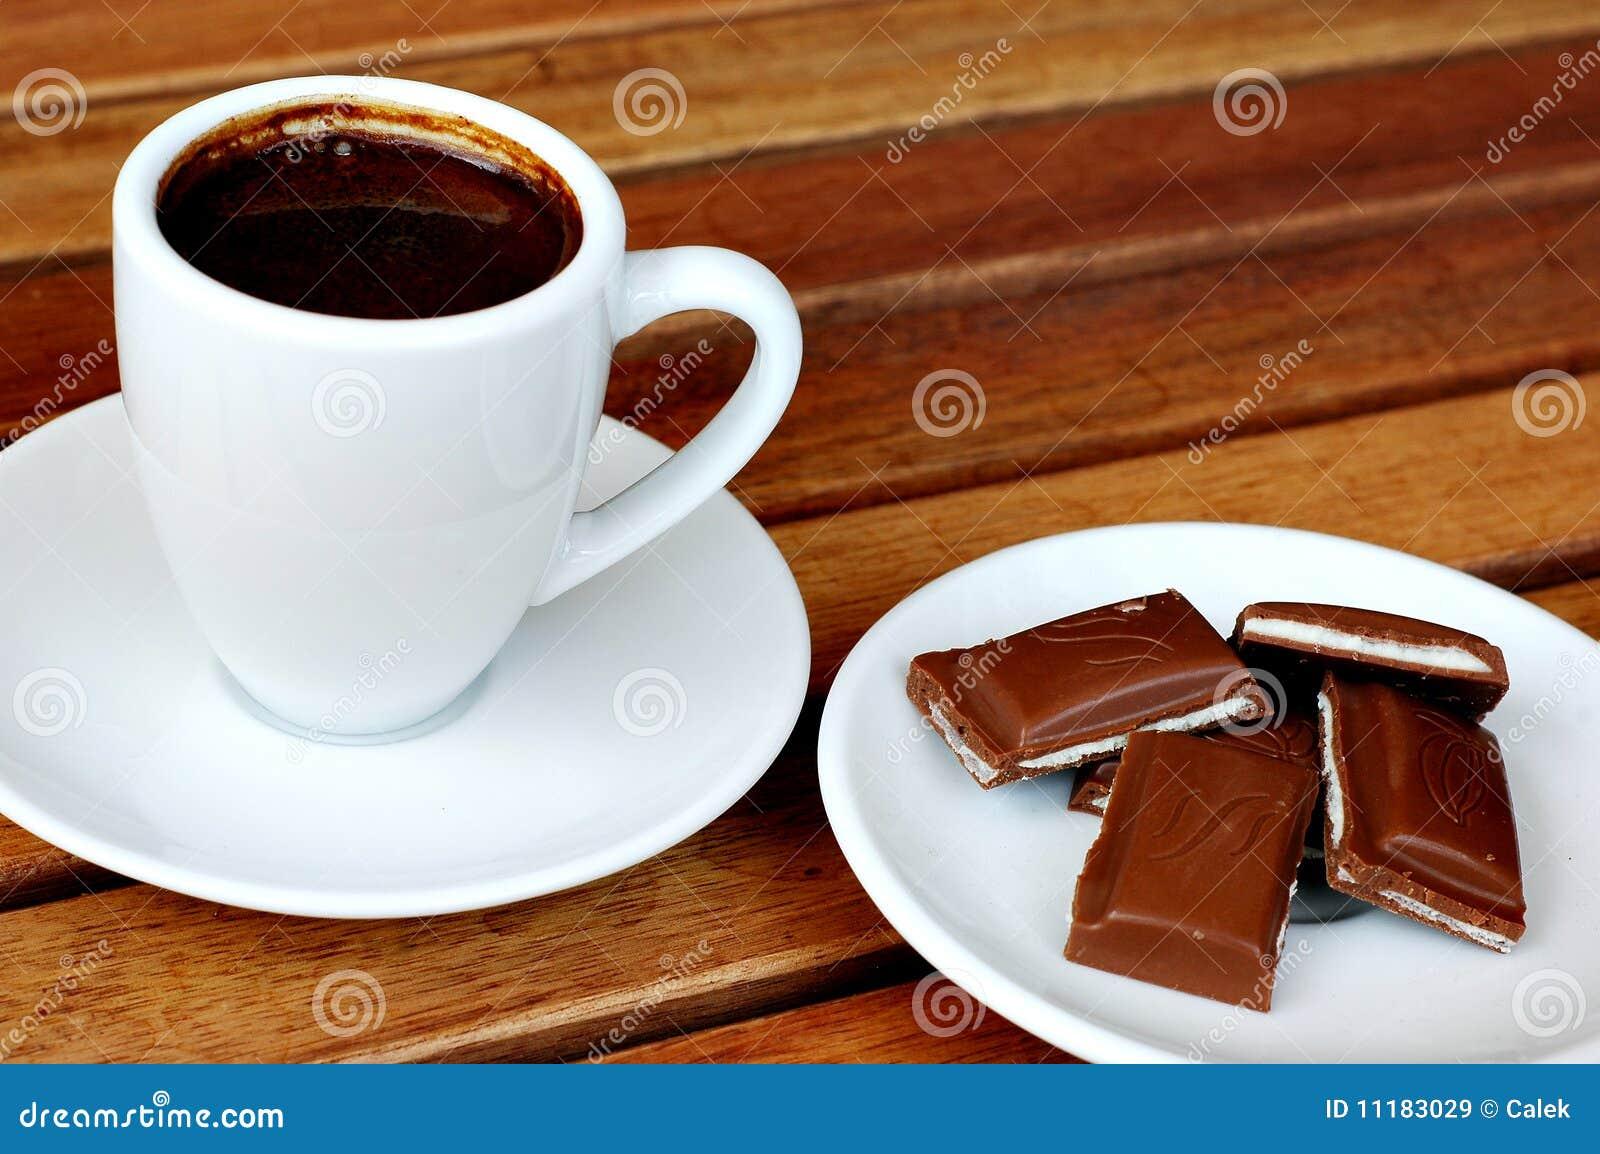 Addiction Food And Coffee